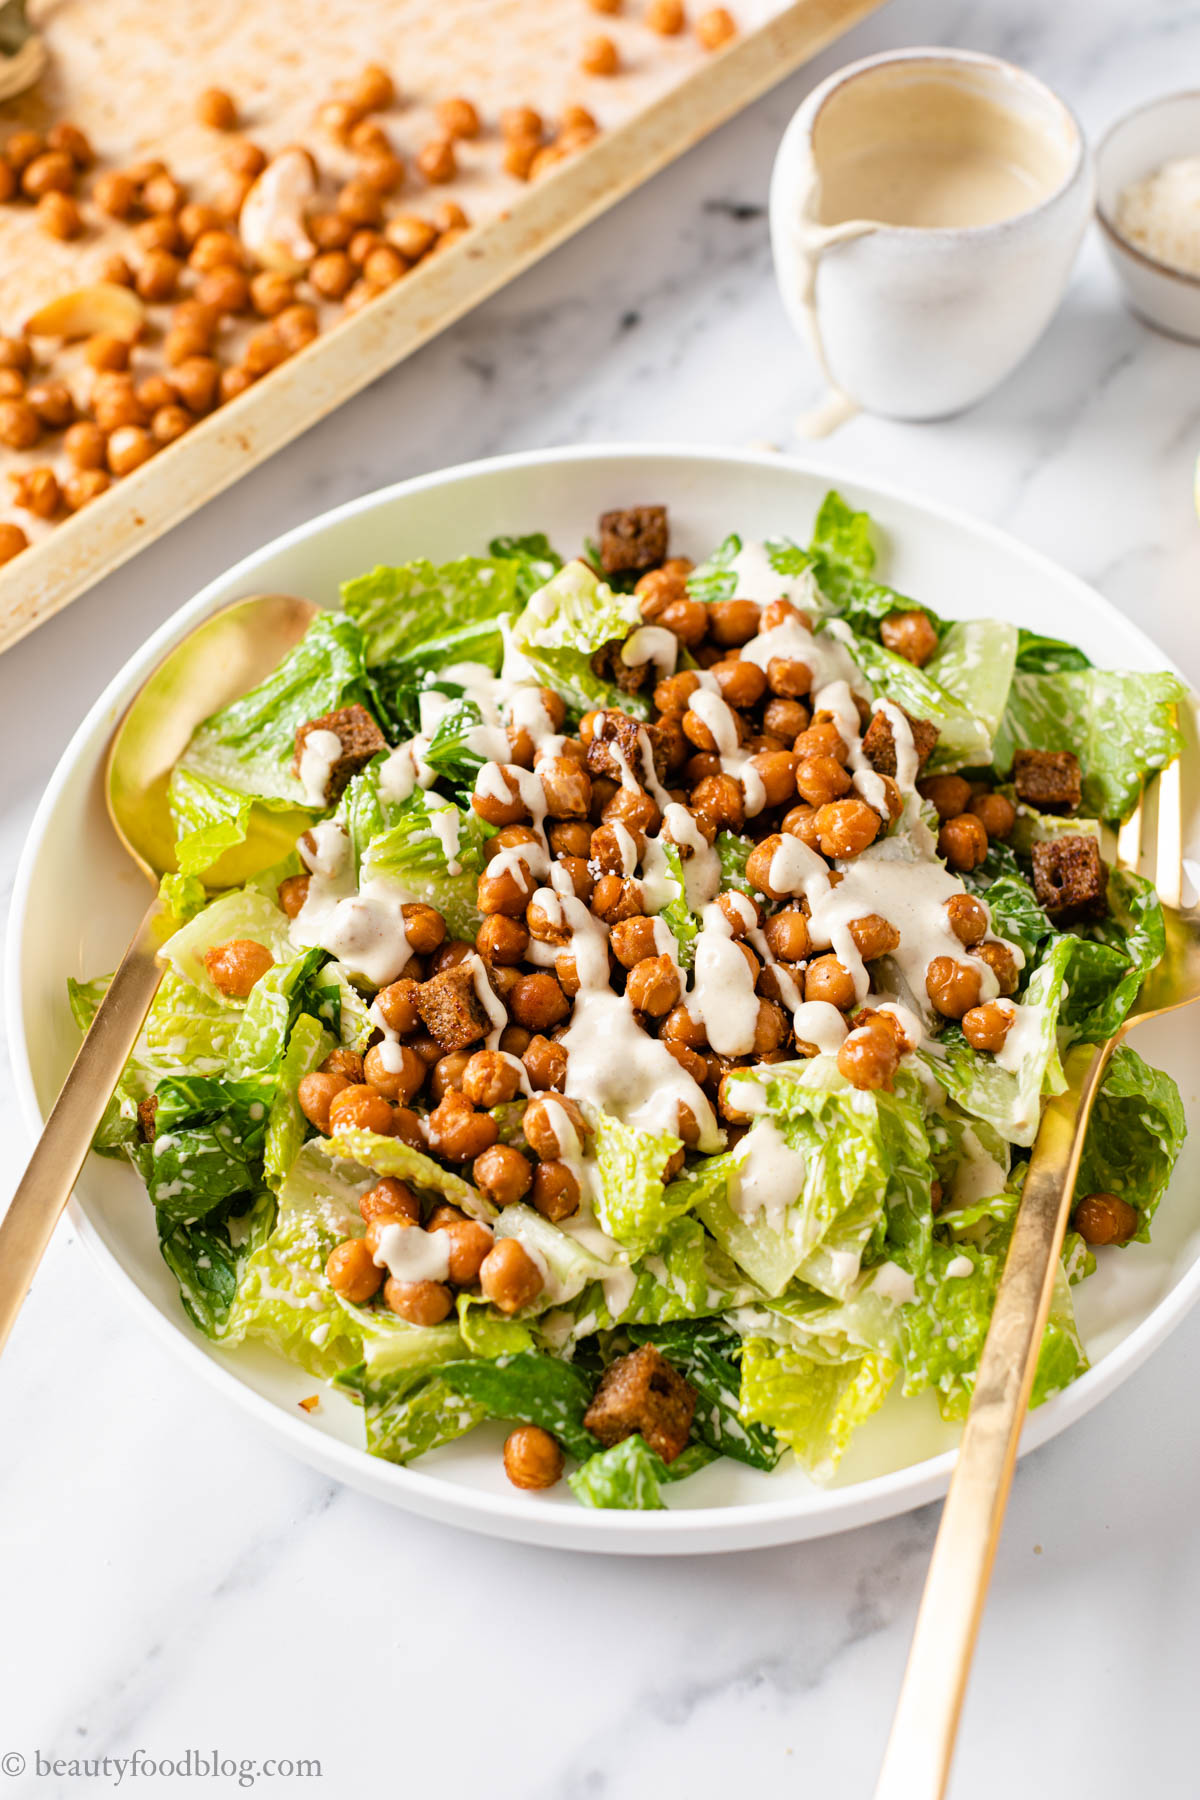 ricetta insalata CAESAR SALAD VEGANA ai CECI Chickpea Vegan Caesar Salad recipe vegan caesar dressing gluten-free